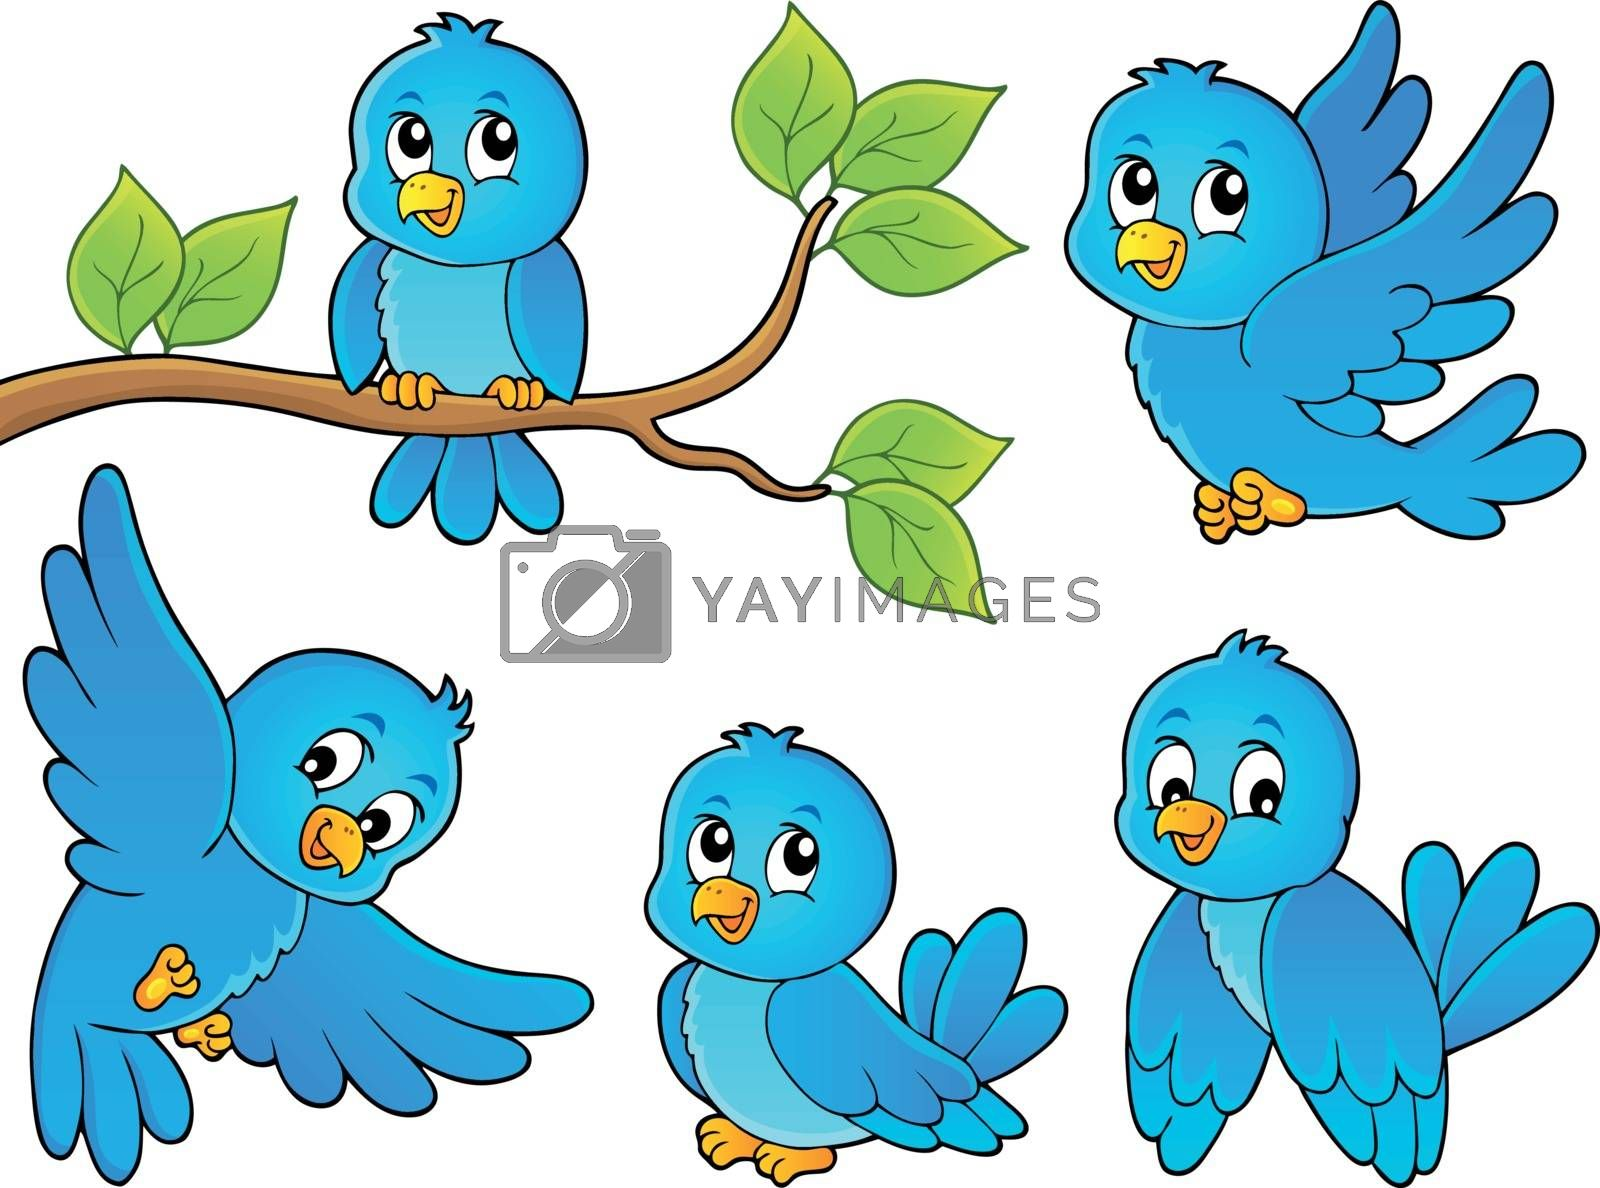 Happy birds theme image 1 - eps10 vector illustration.